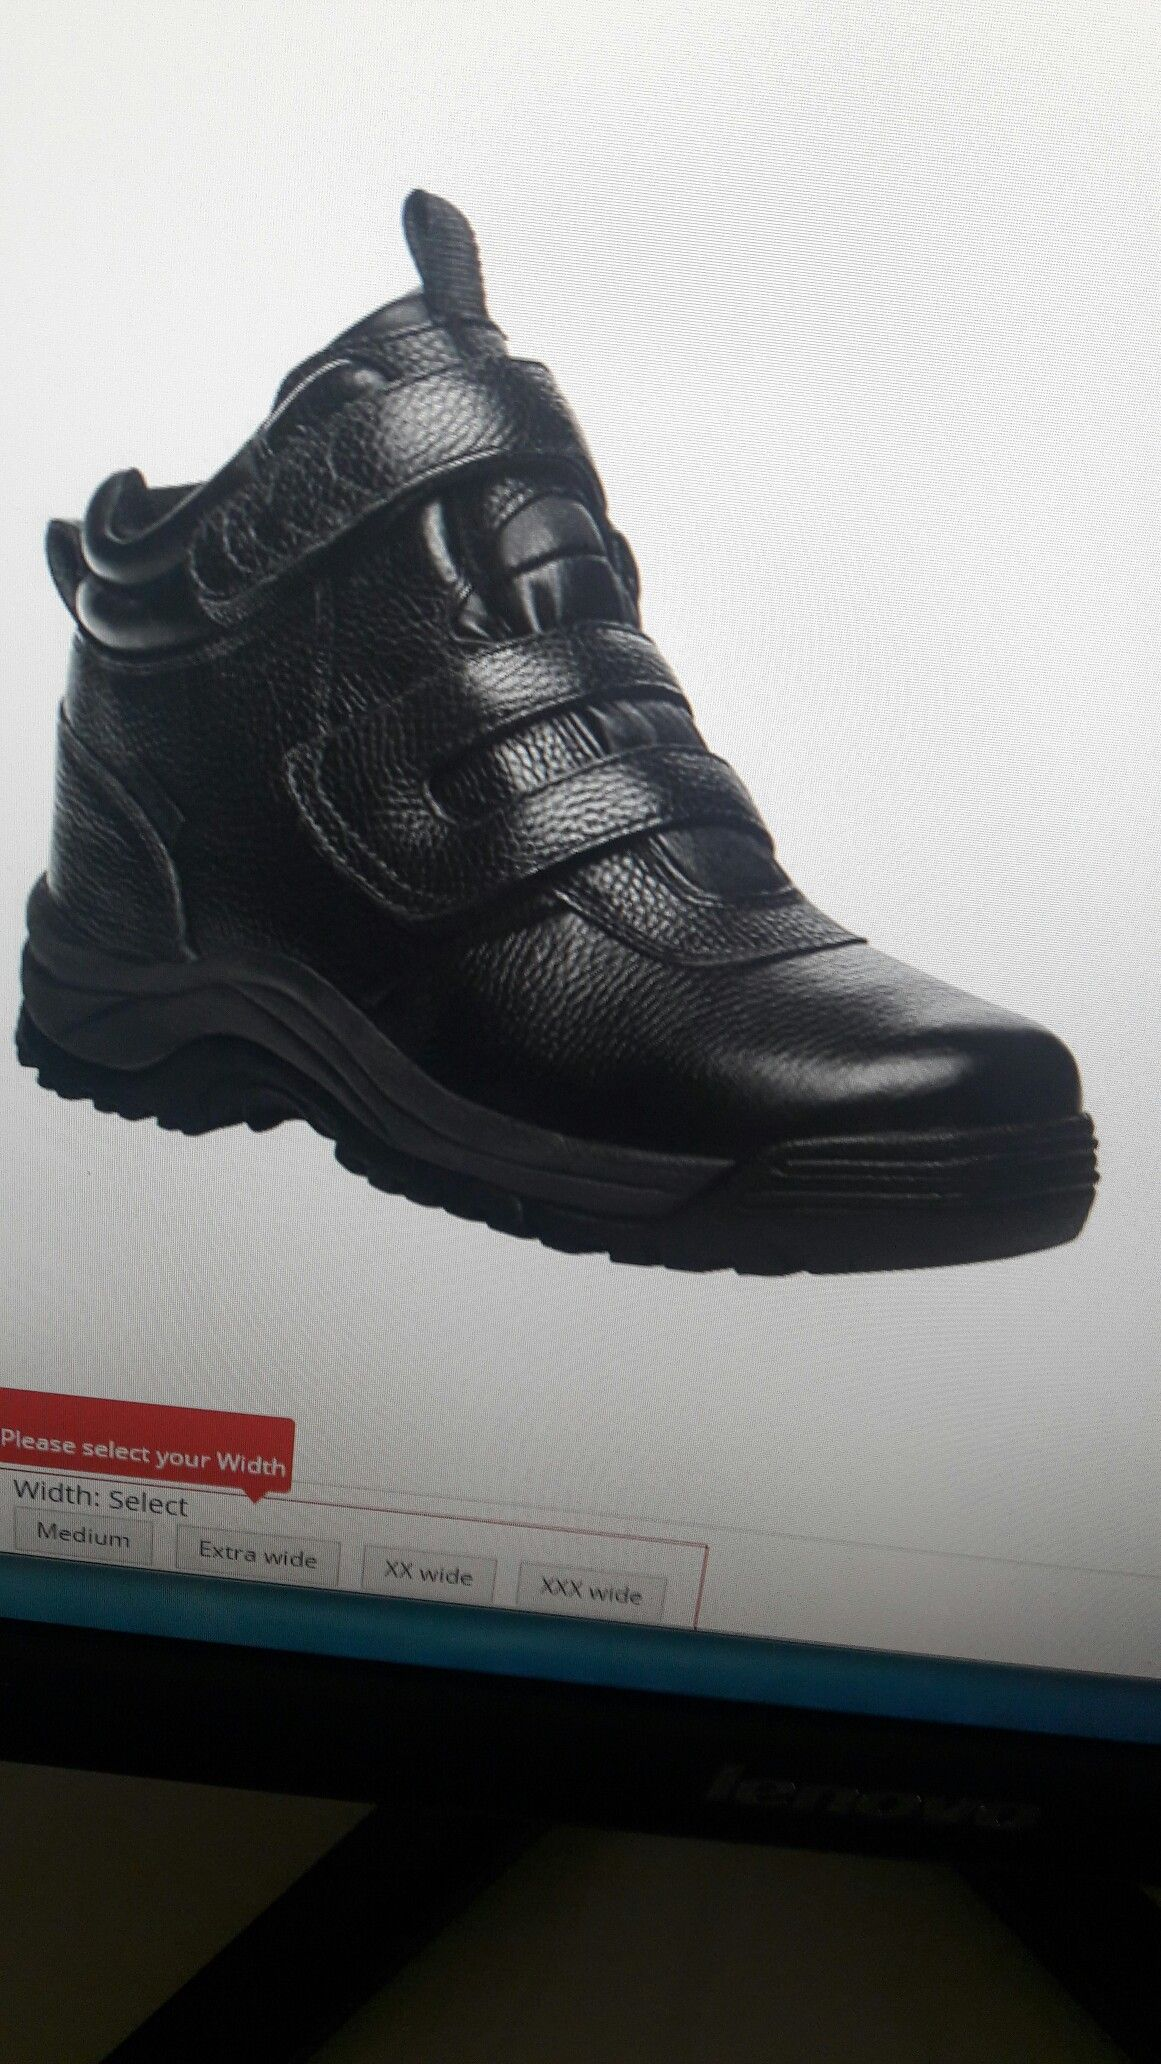 Proppet zapato diabetico